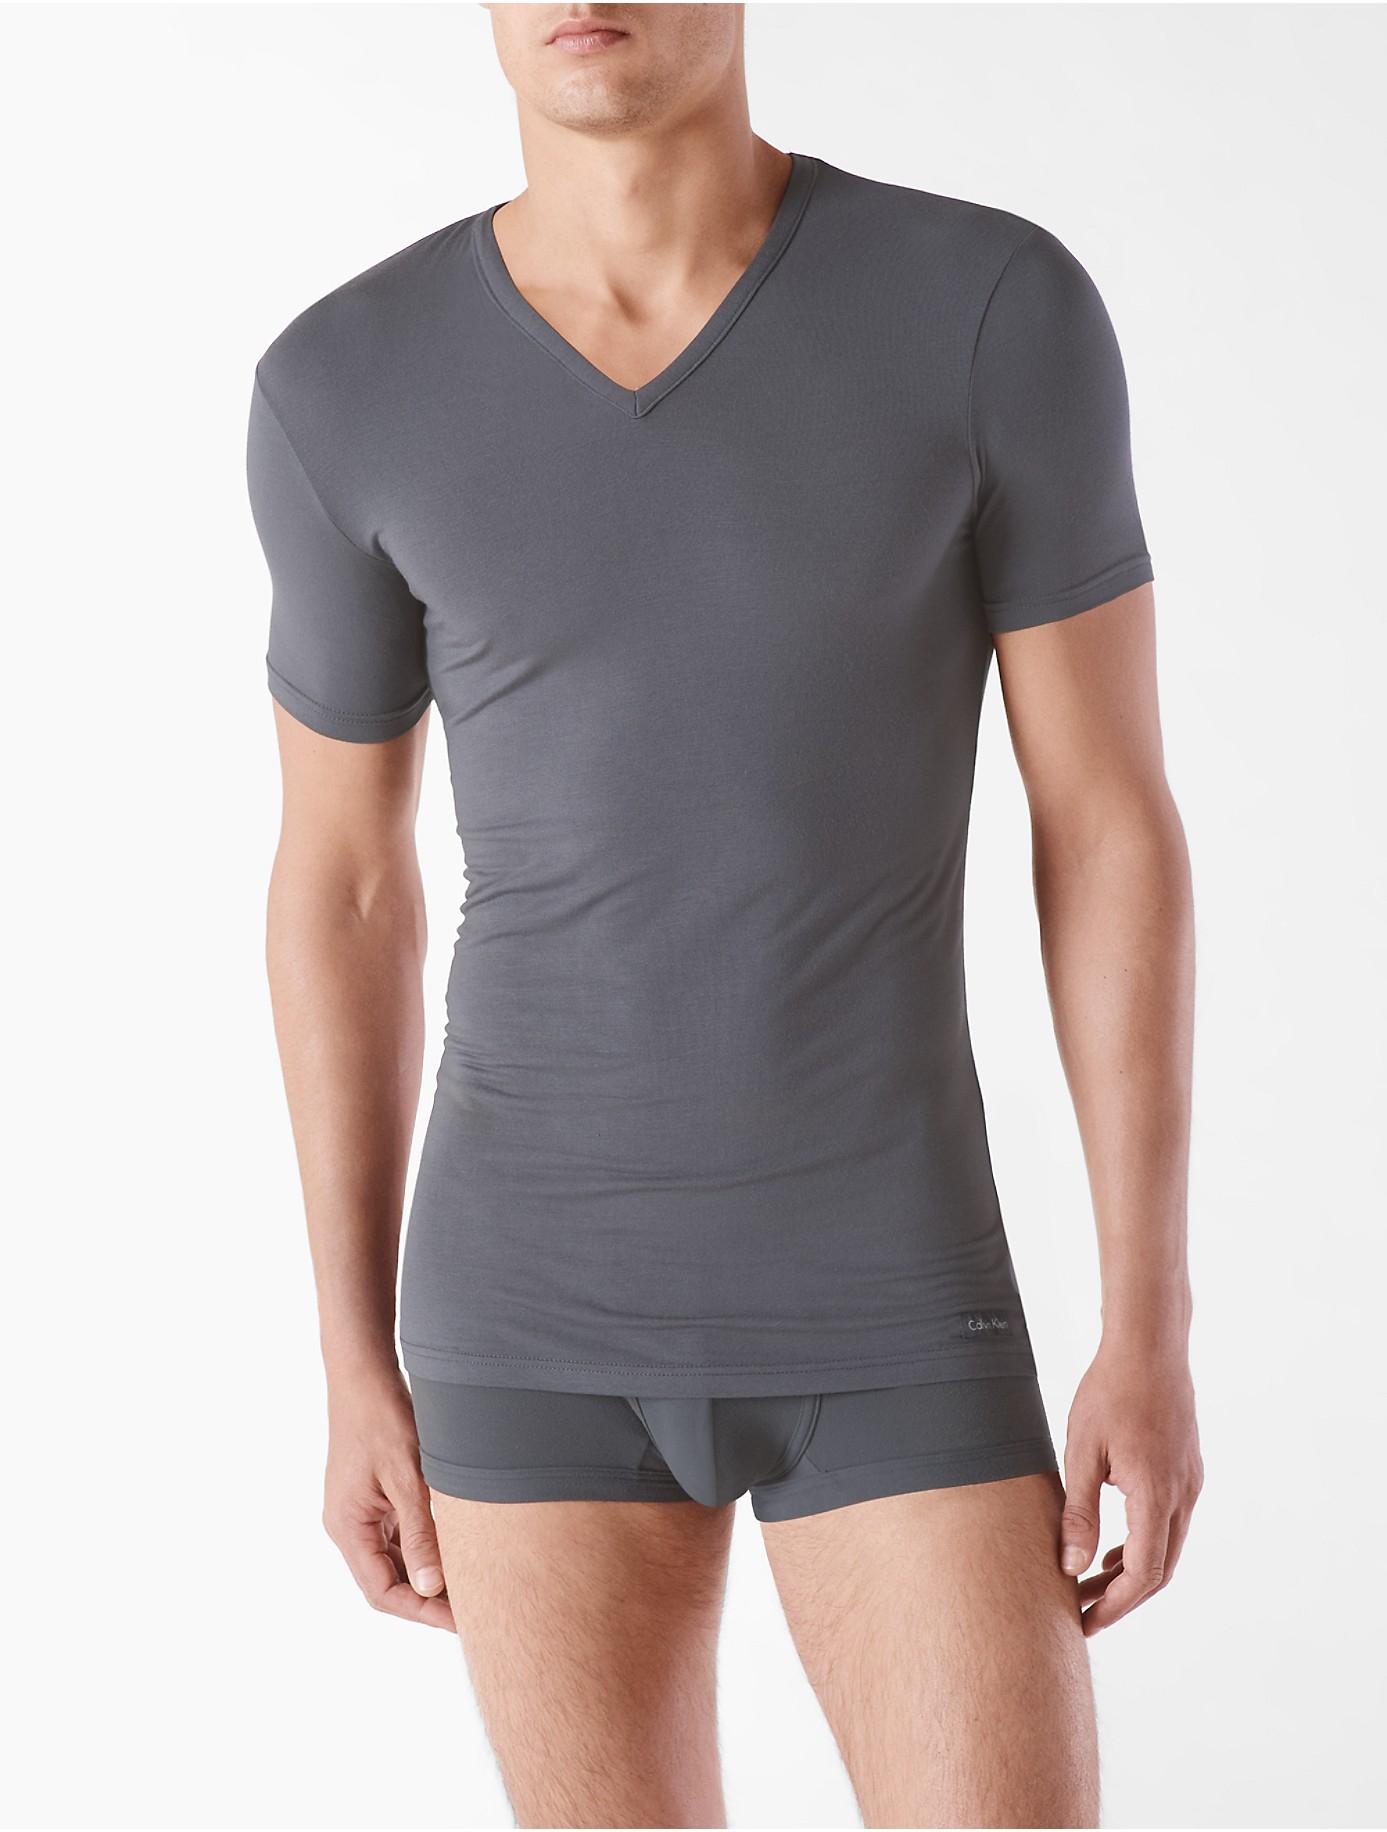 calvin klein gray underwear body modal v neck t shirt for men lyst. Black Bedroom Furniture Sets. Home Design Ideas